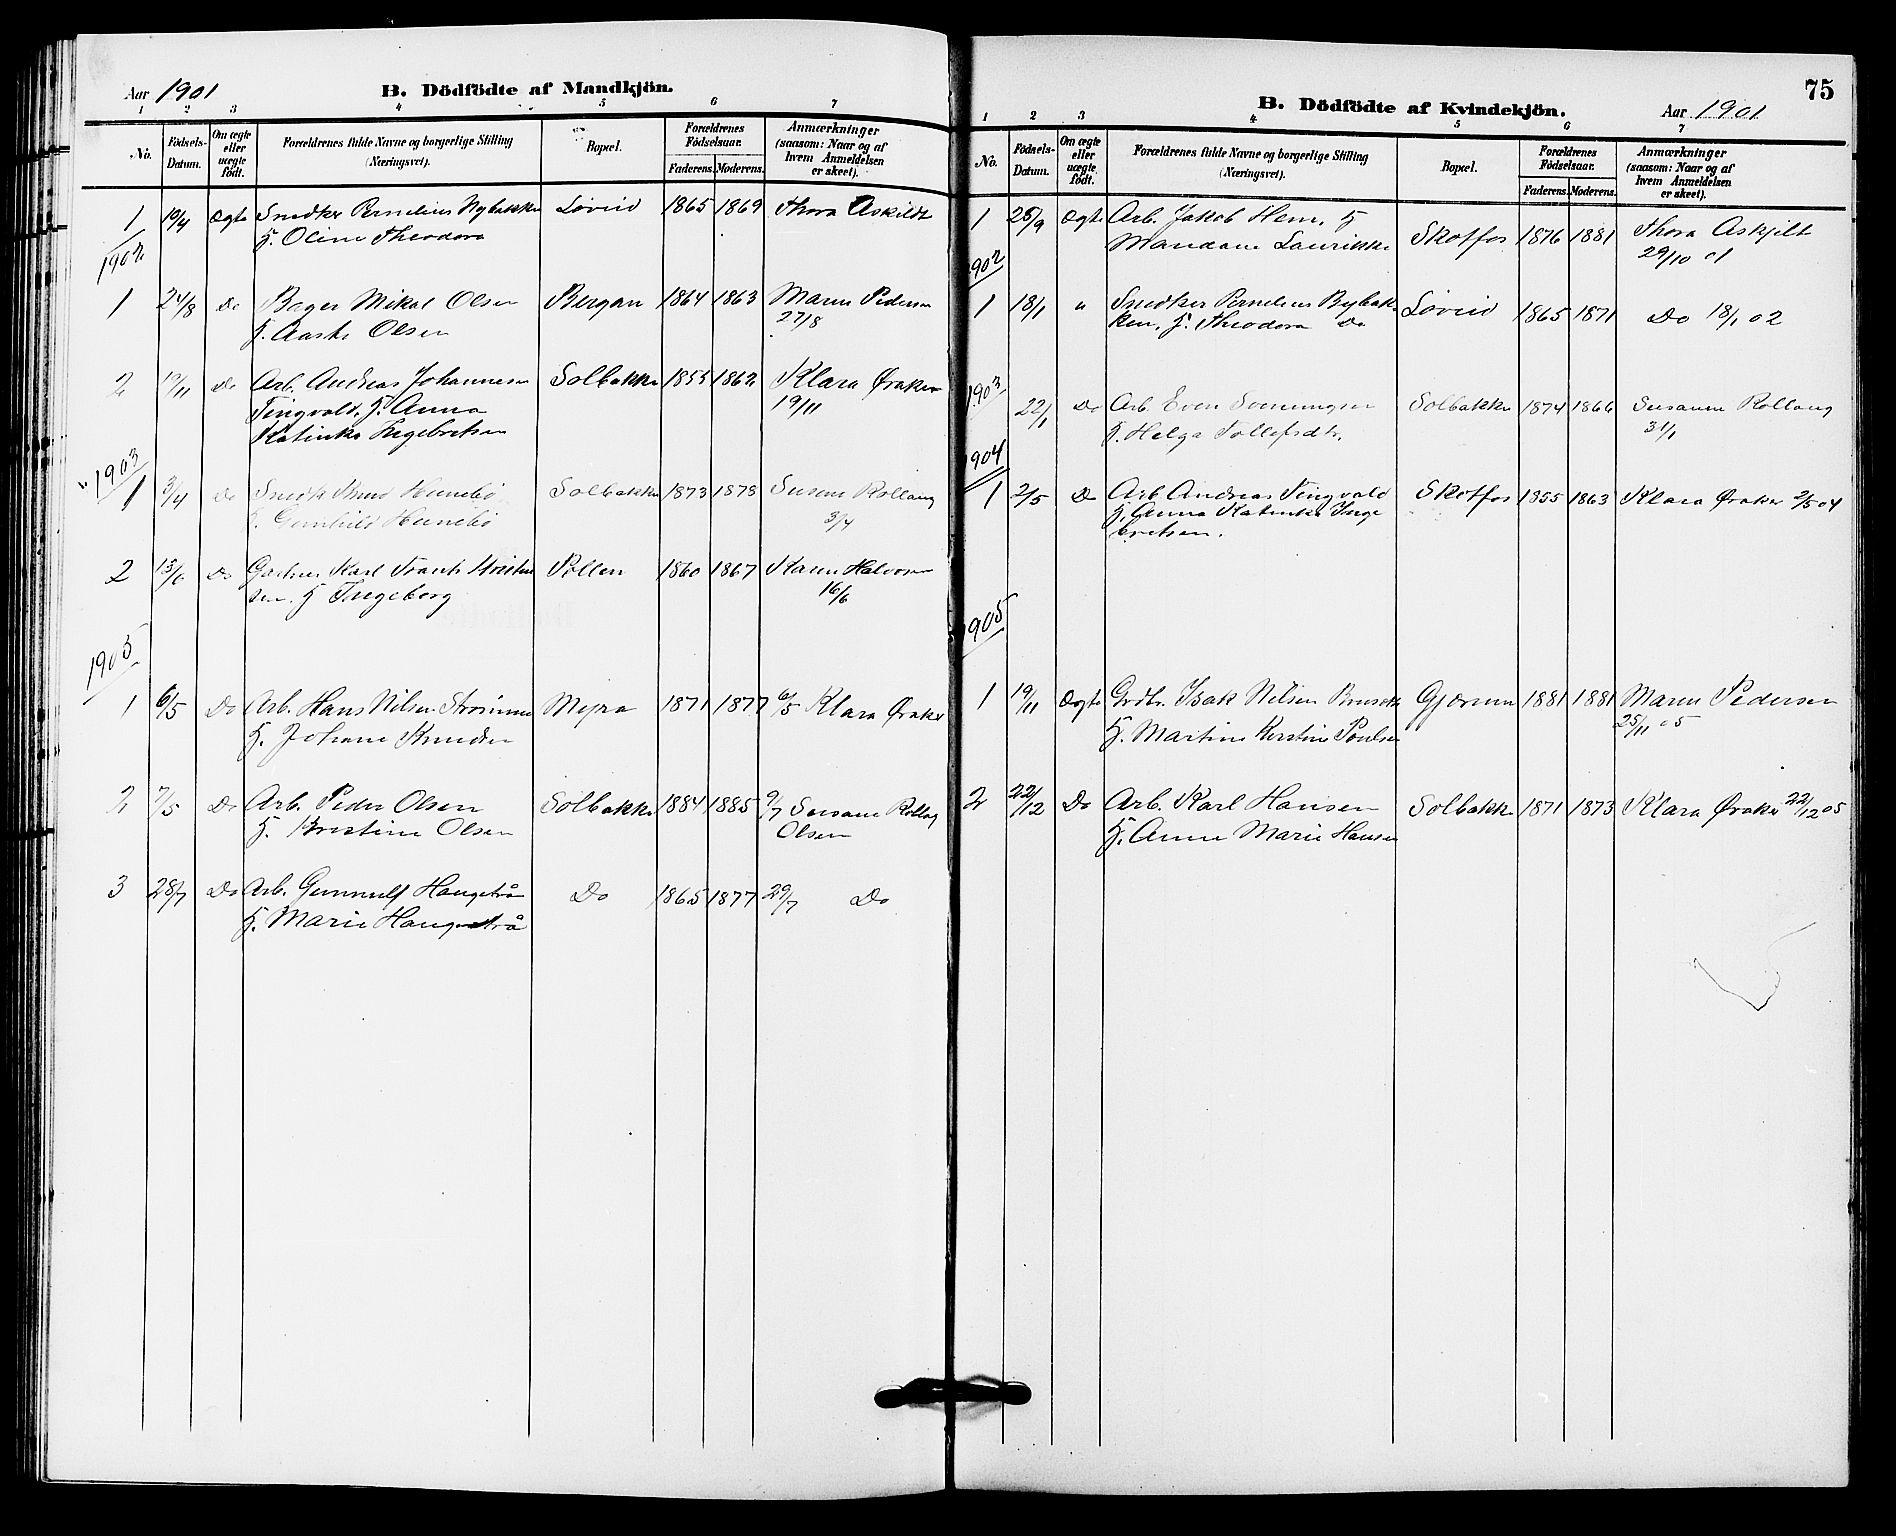 SAKO, Solum kirkebøker, G/Gb/L0004: Klokkerbok nr. II 4, 1898-1905, s. 75